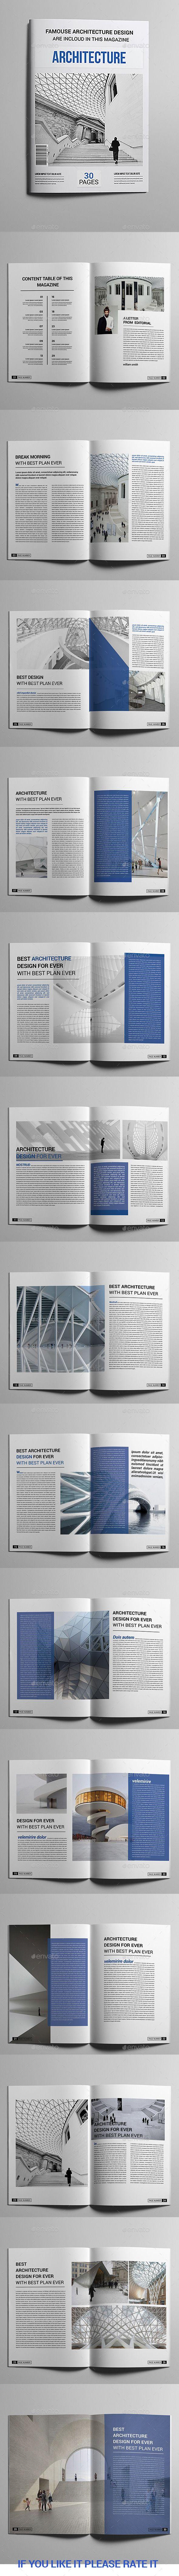 Architecture Magazine Template #design Download: http://graphicriver.net/item/architecture-magazine-design-/13642789?ref=ksioks